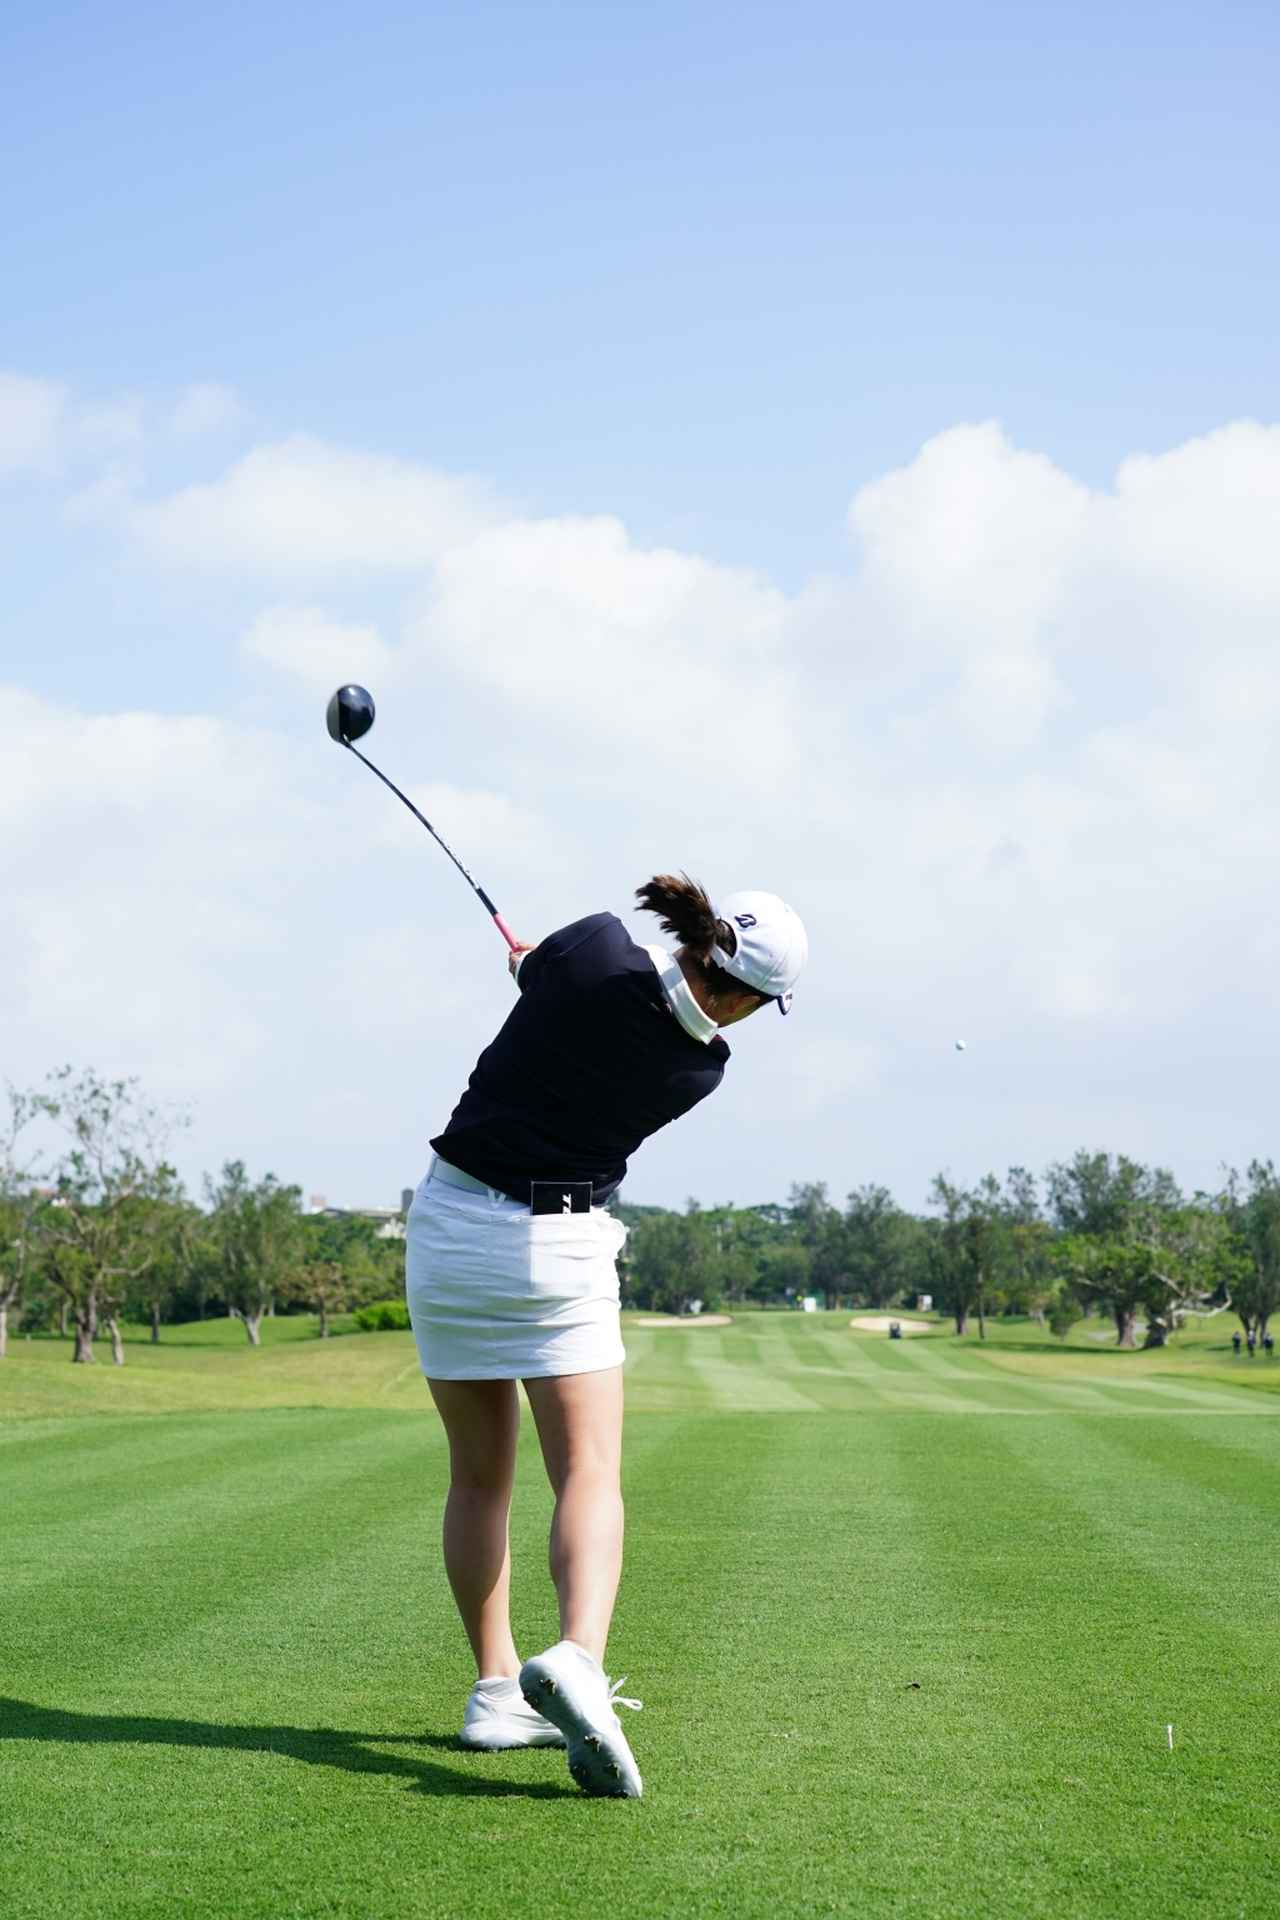 Images : 16番目の画像 - 丹萌乃のドライバー連続写真 - みんなのゴルフダイジェスト